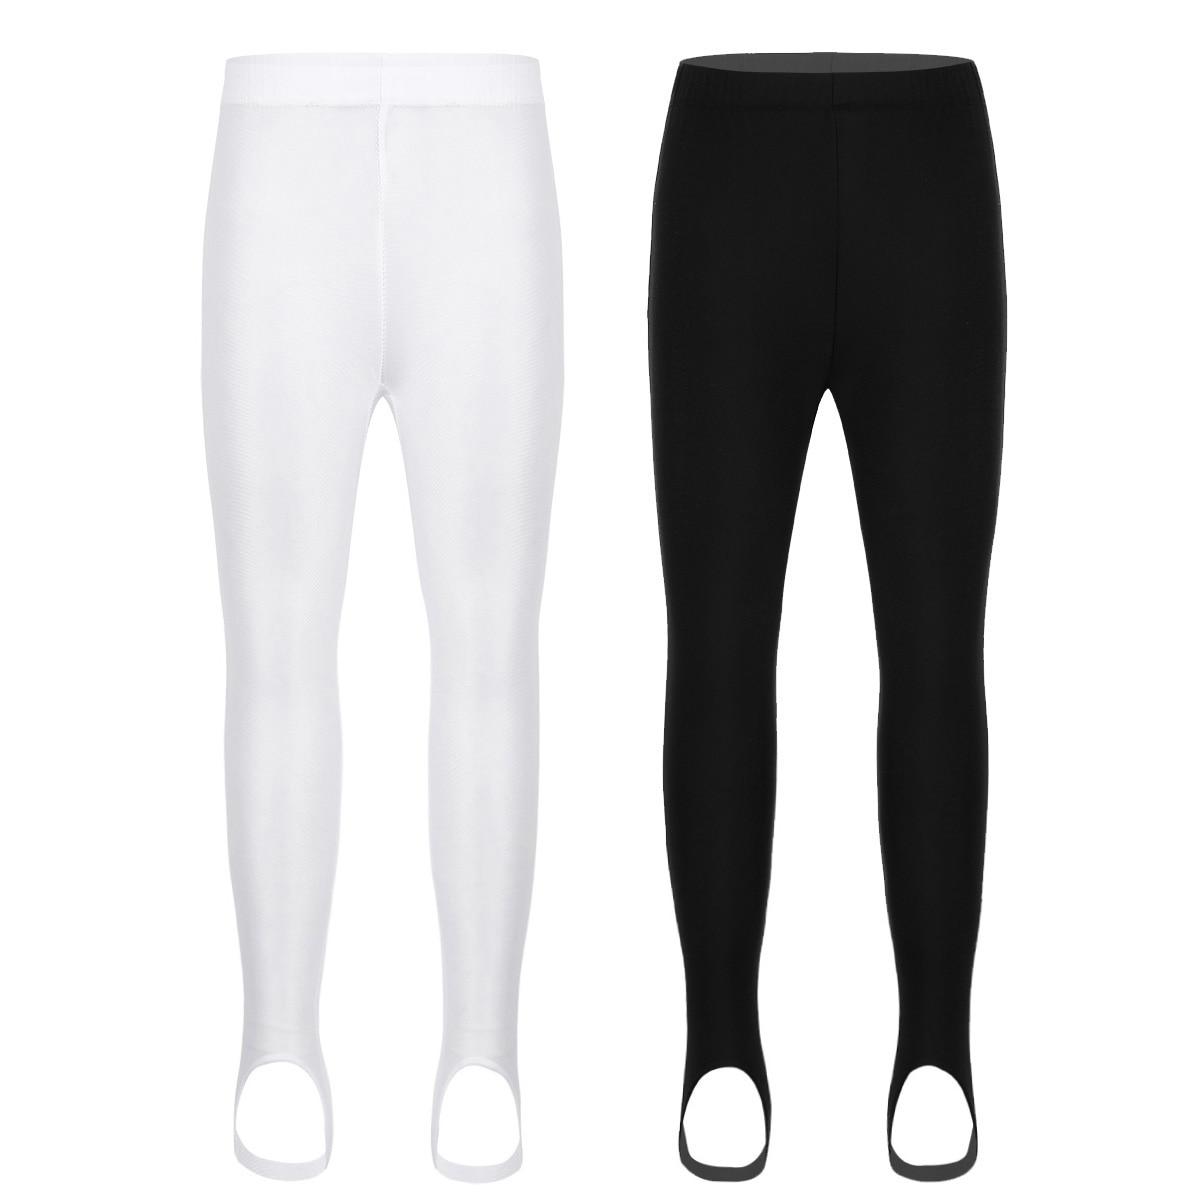 Girls Ballet Dance Stirrup Pantyhose Stockings Tights Yoga Gymnastics Sports